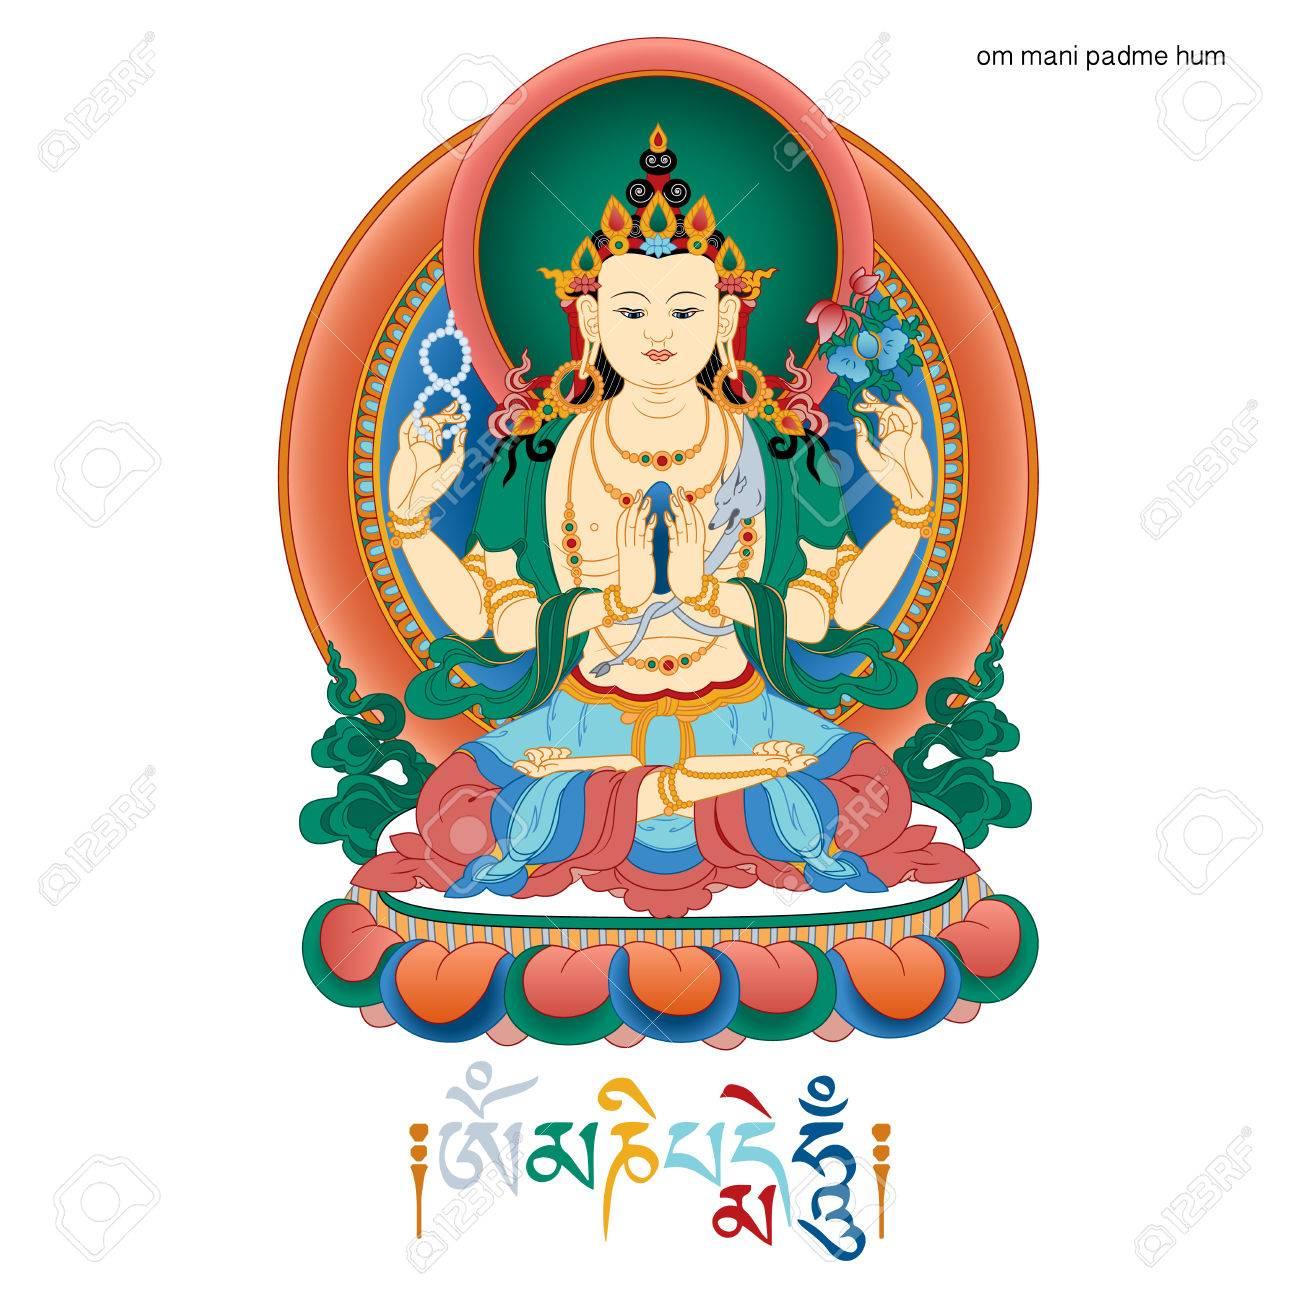 Vector illustration with bodhisattva avalokiteshvara and mantra om vector illustration with bodhisattva avalokiteshvara and mantra om mani padme hum bodhisattva who embodies the buycottarizona